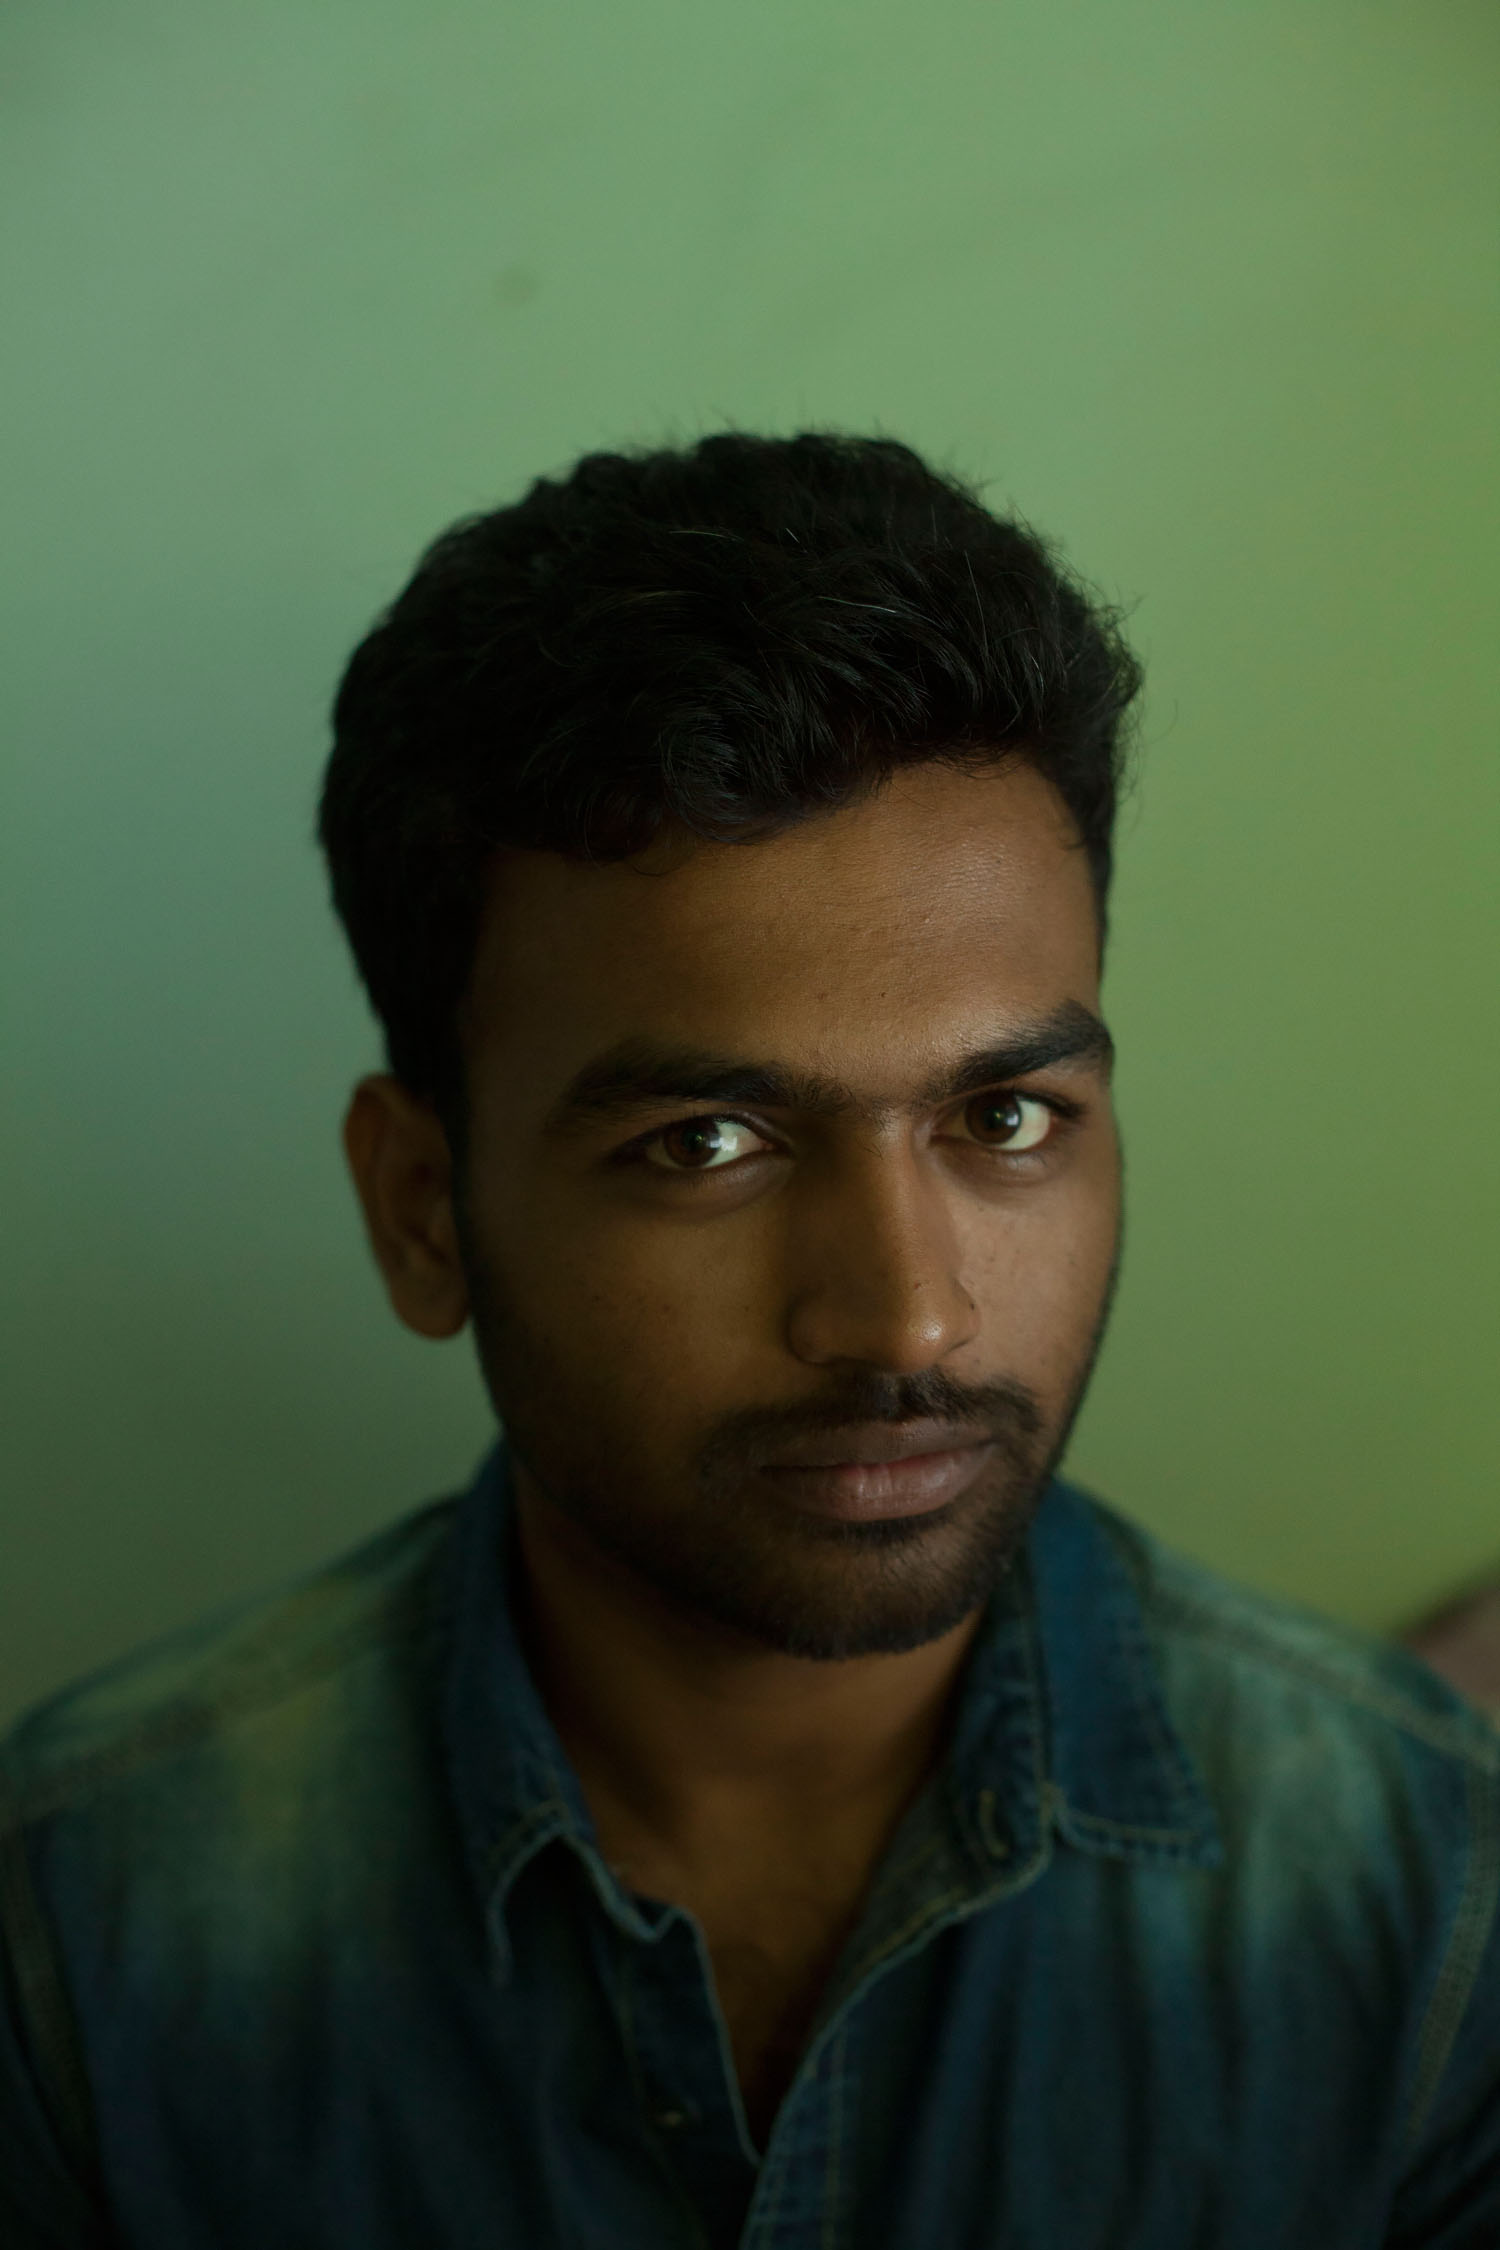 Online gay dating mumbai r